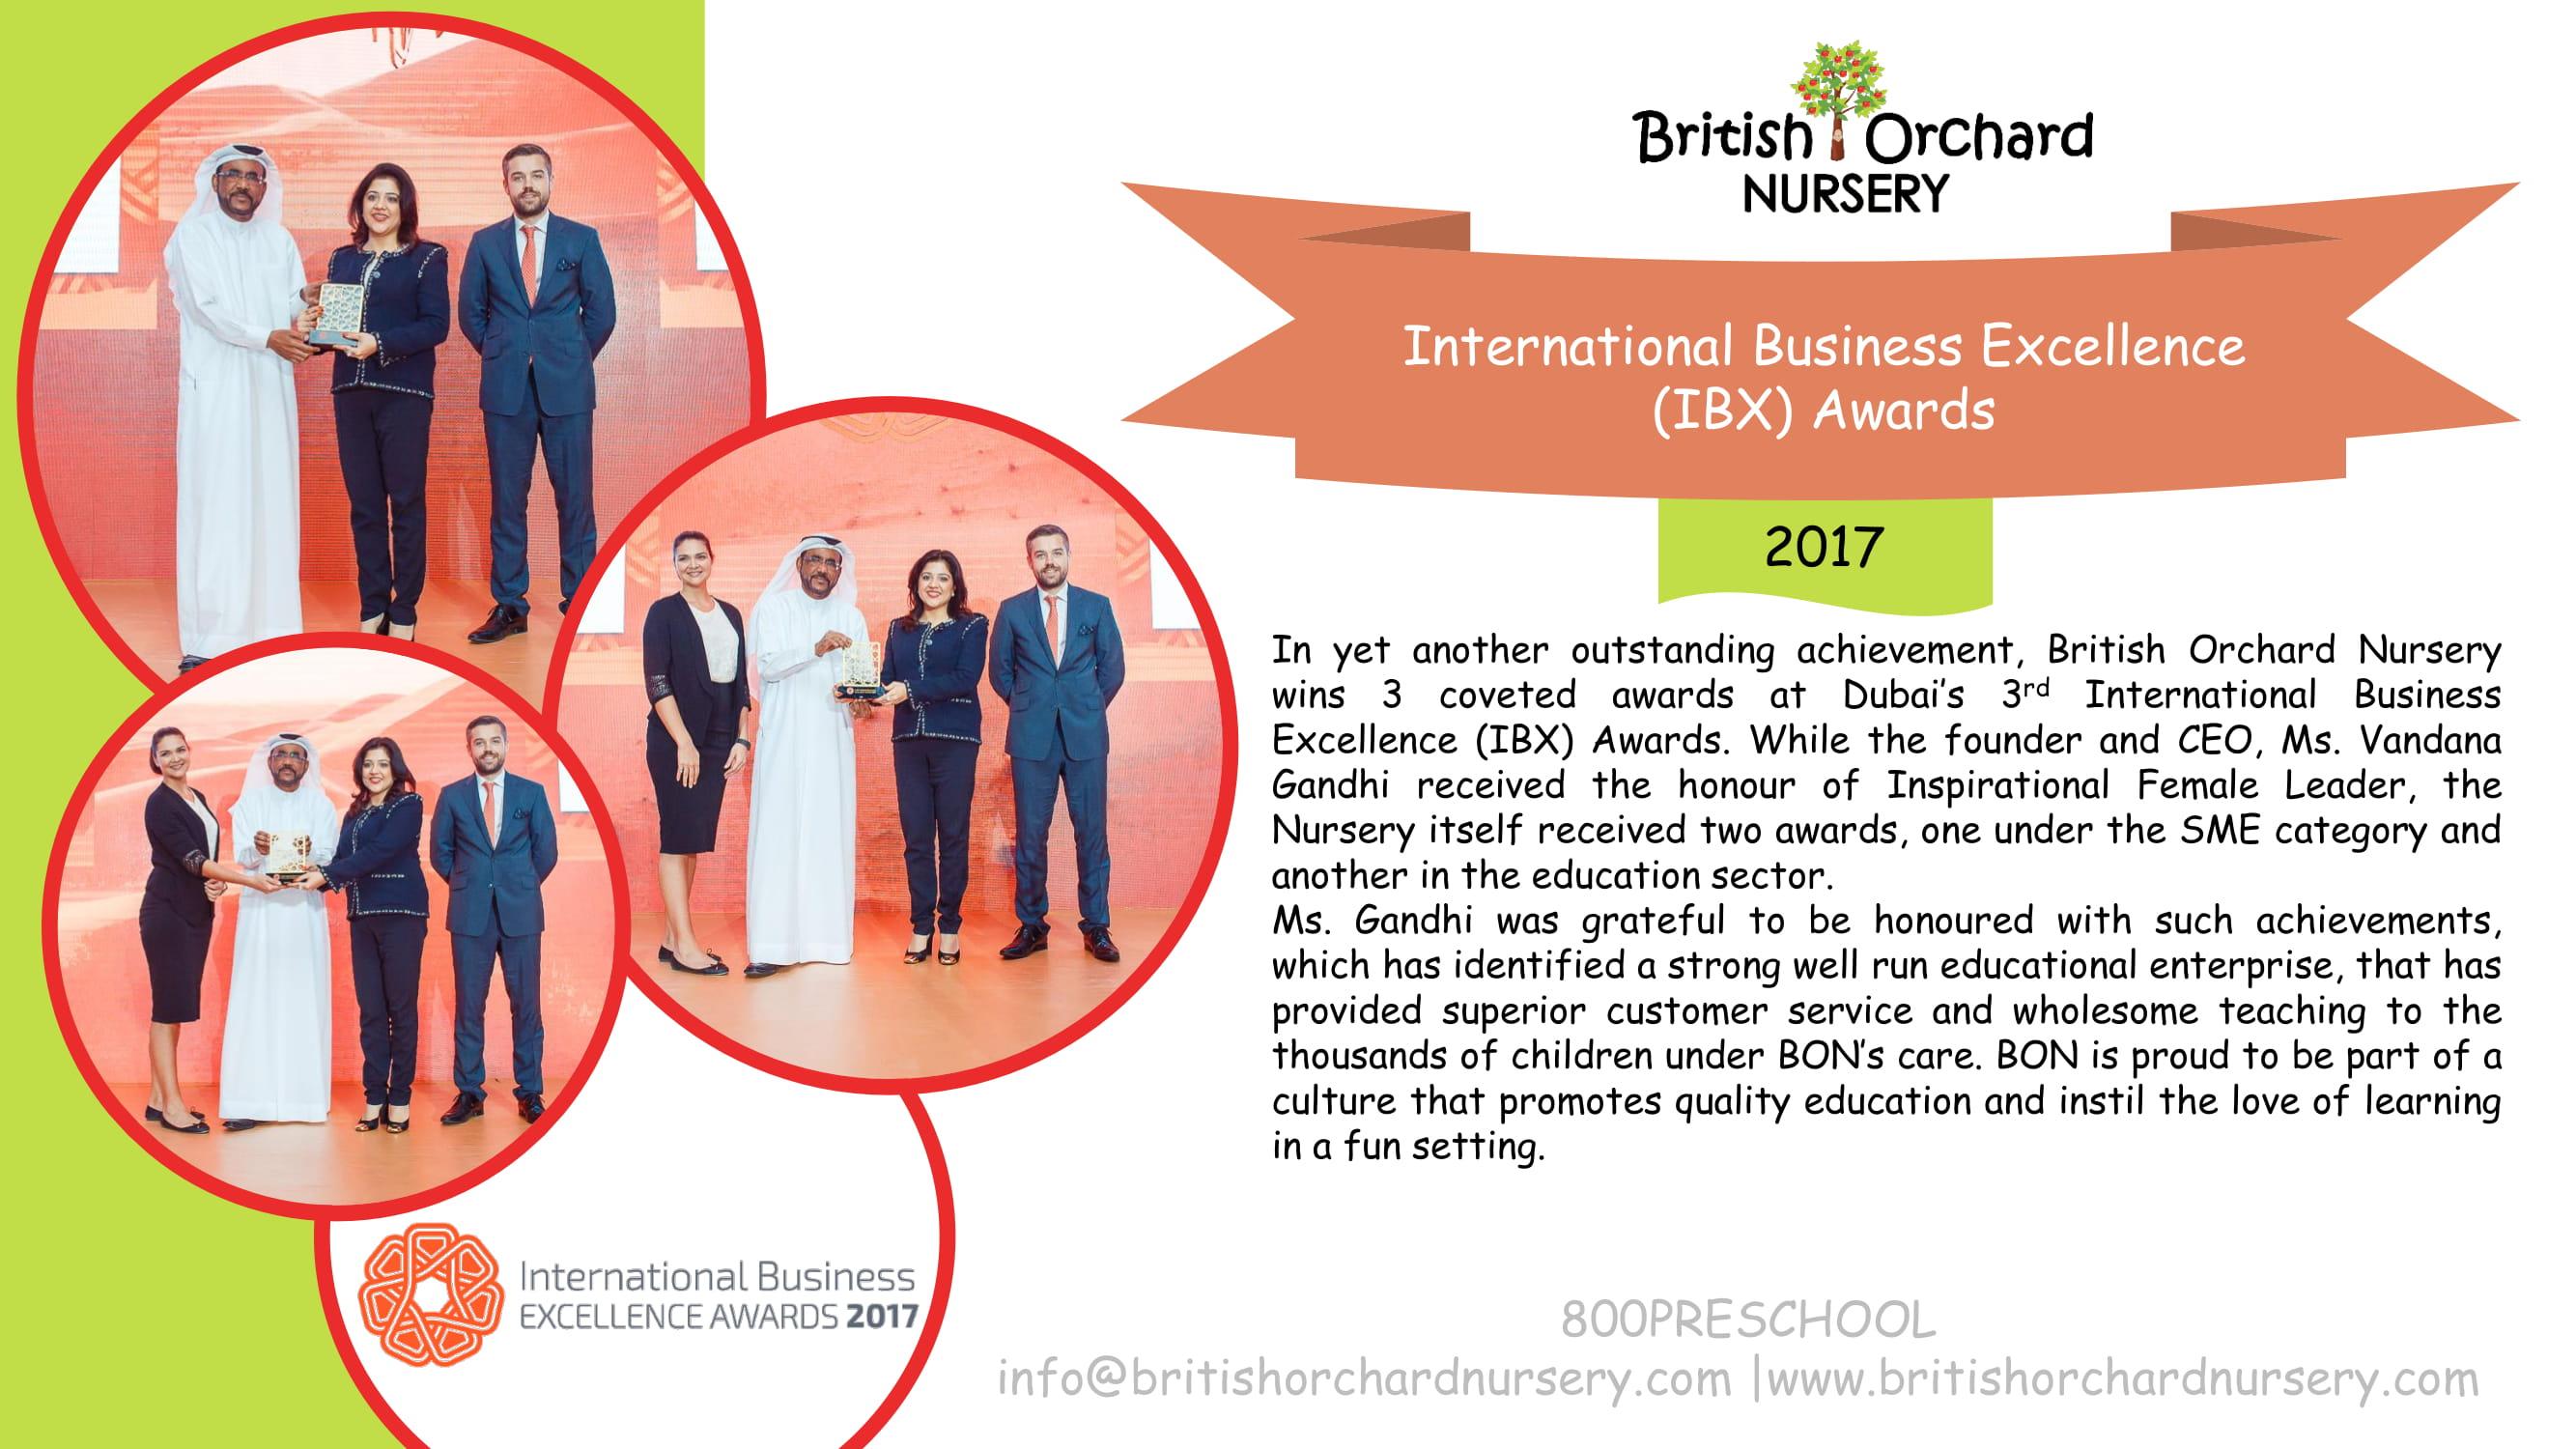 Award Winning Nursery Preschool And Daycare British Orchard Nursery